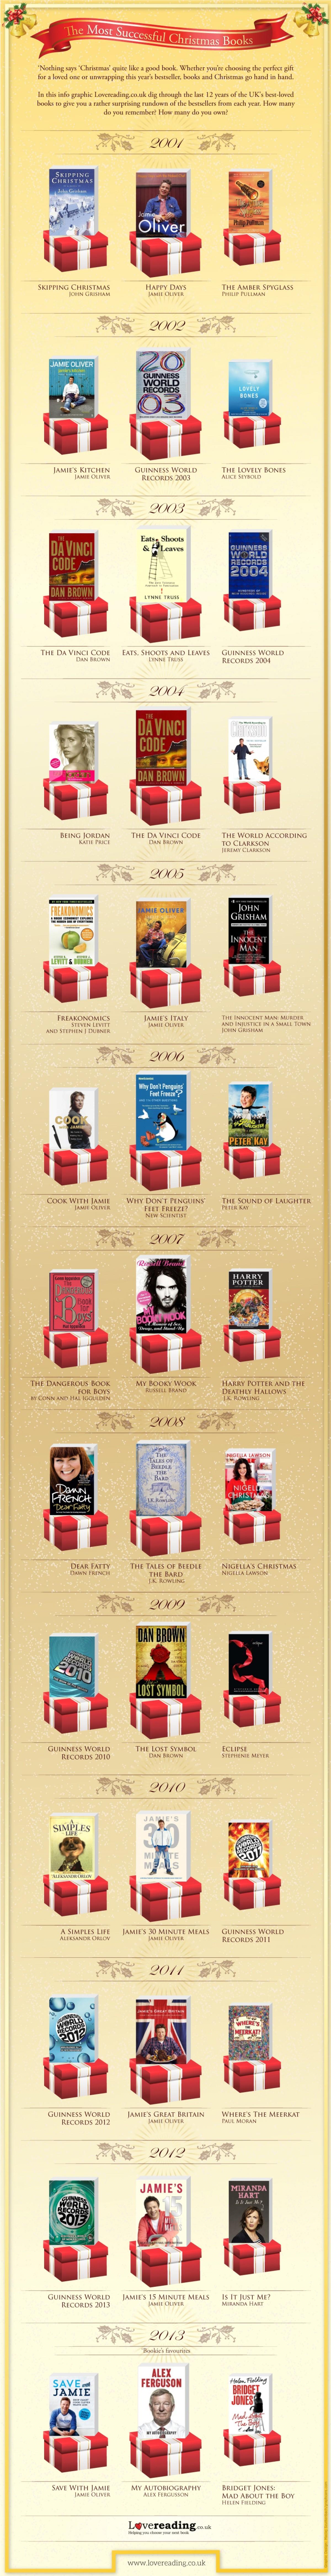 bestselling-christmas-books_529c5f1da77ff_w1500